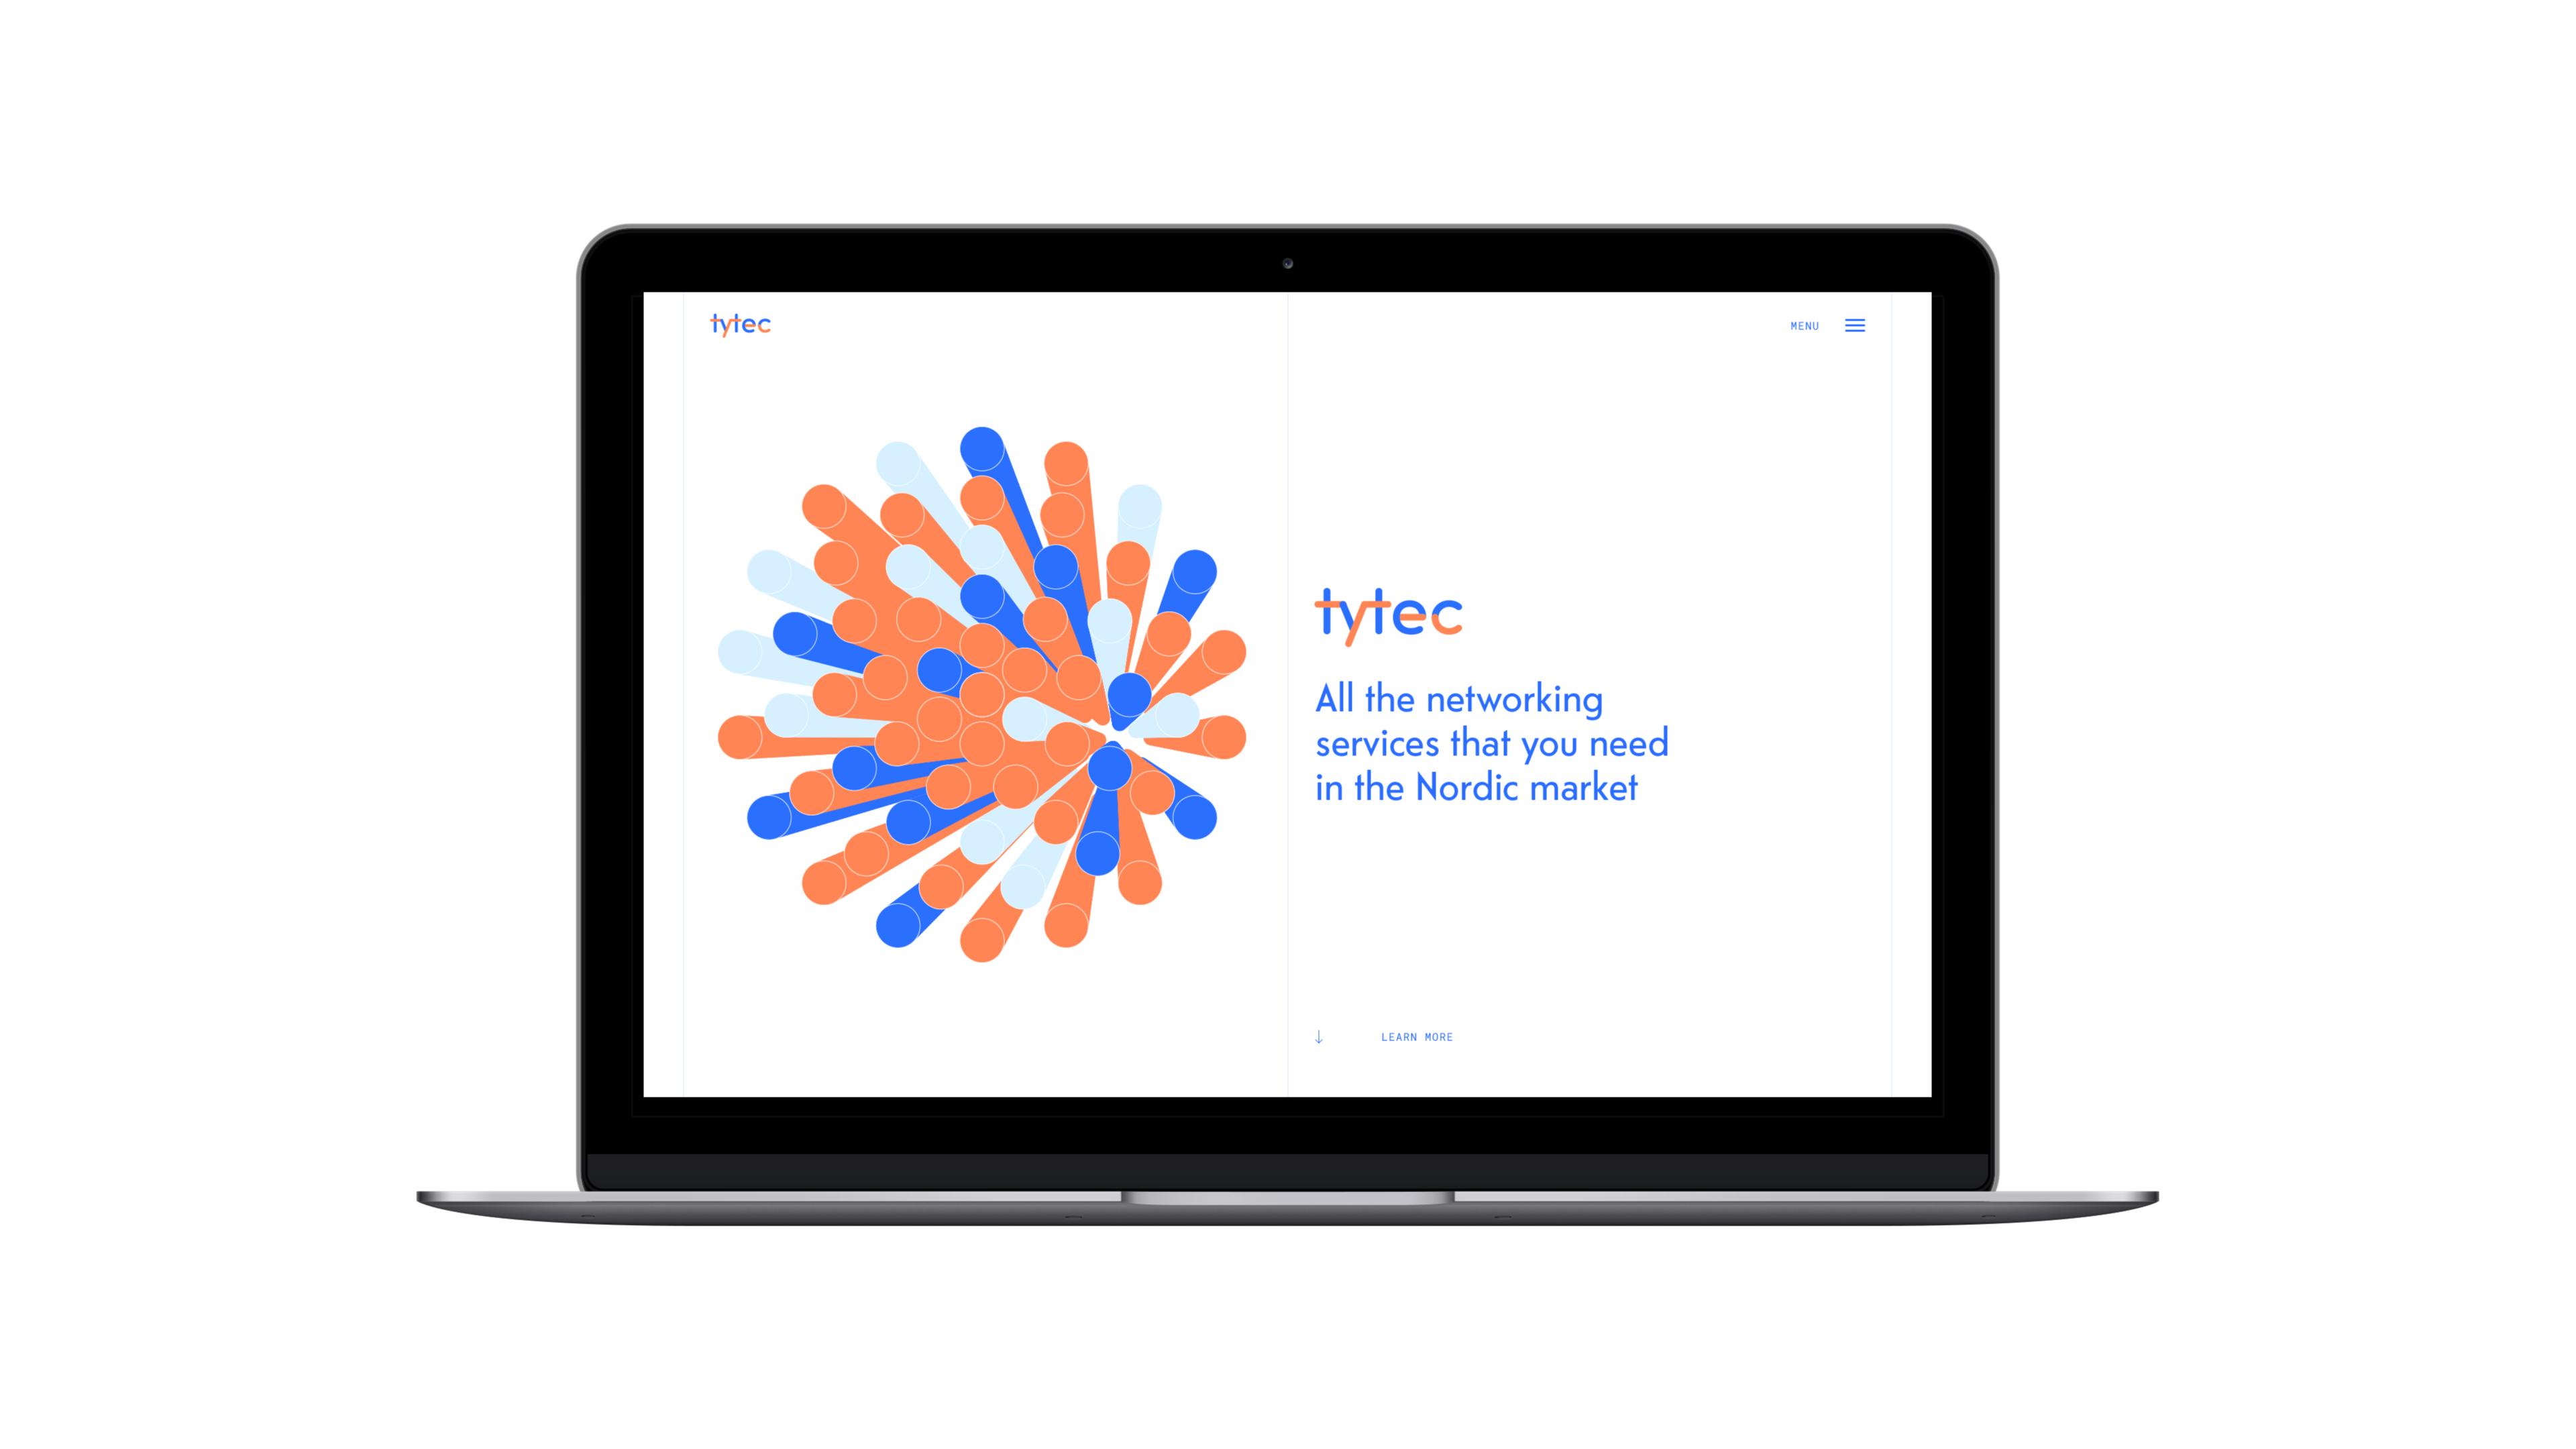 Tytec - The Codeine Design